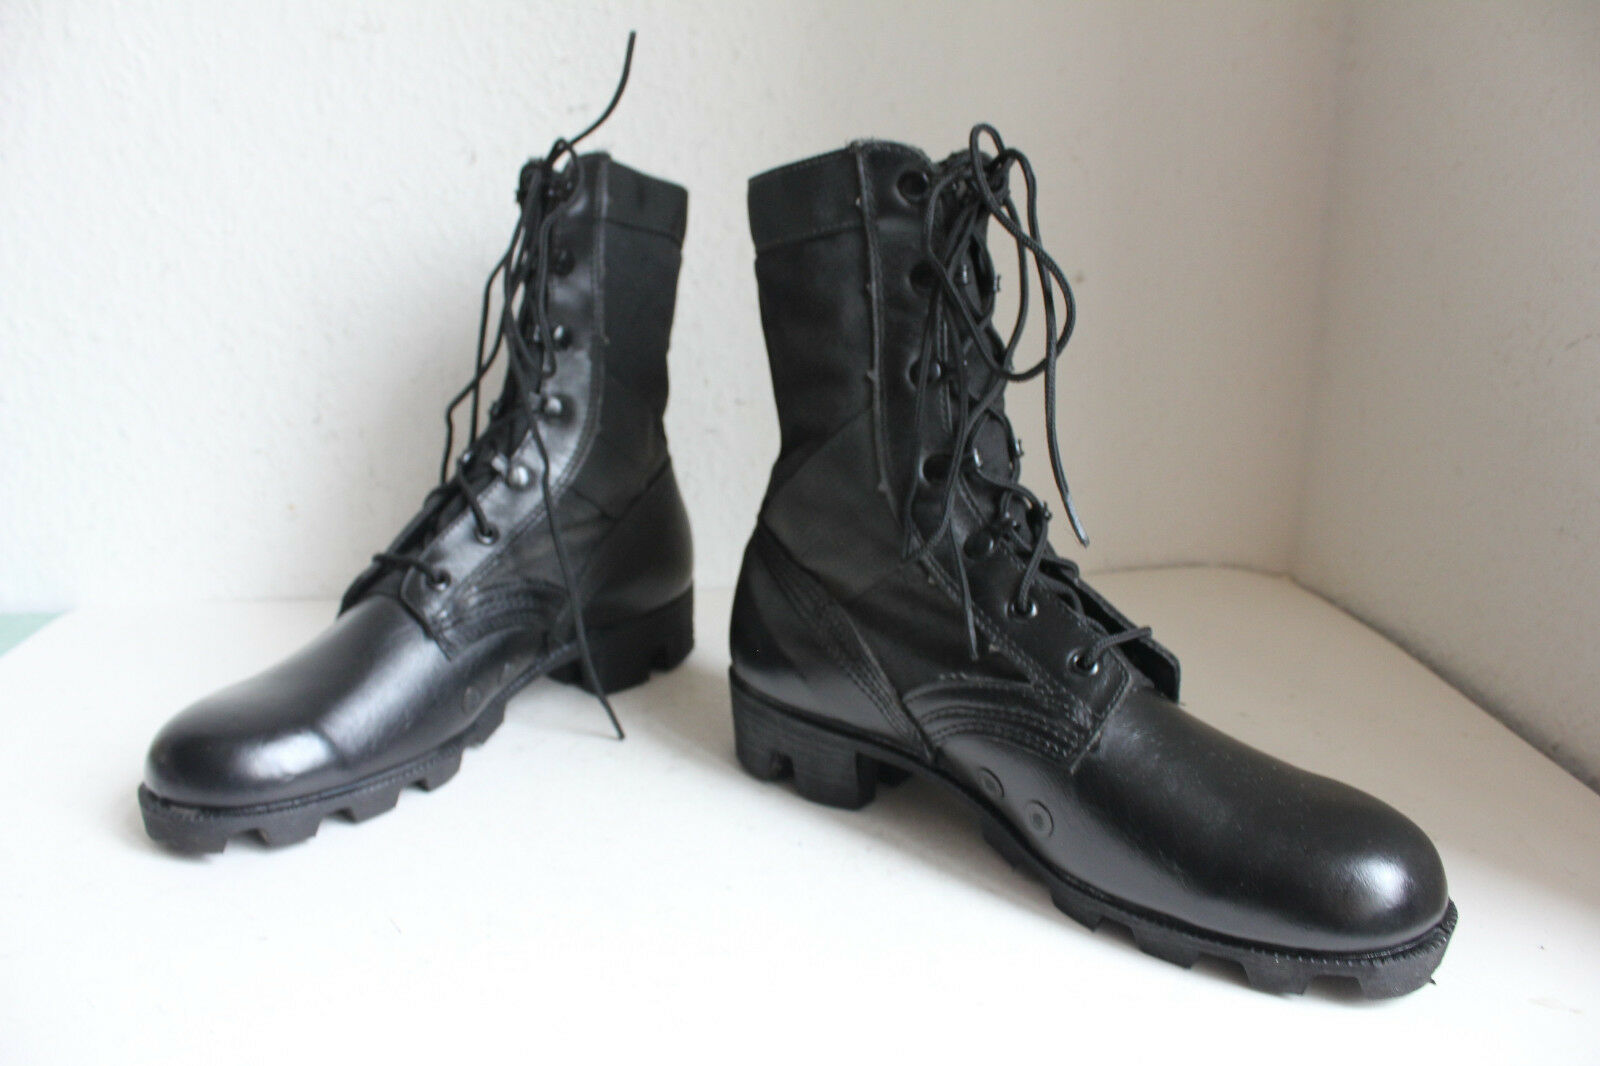 Spike Protective Safety Elegante Stiefel Echtleder Schwarz Eu:39,5-40-Uk:7 wie neu